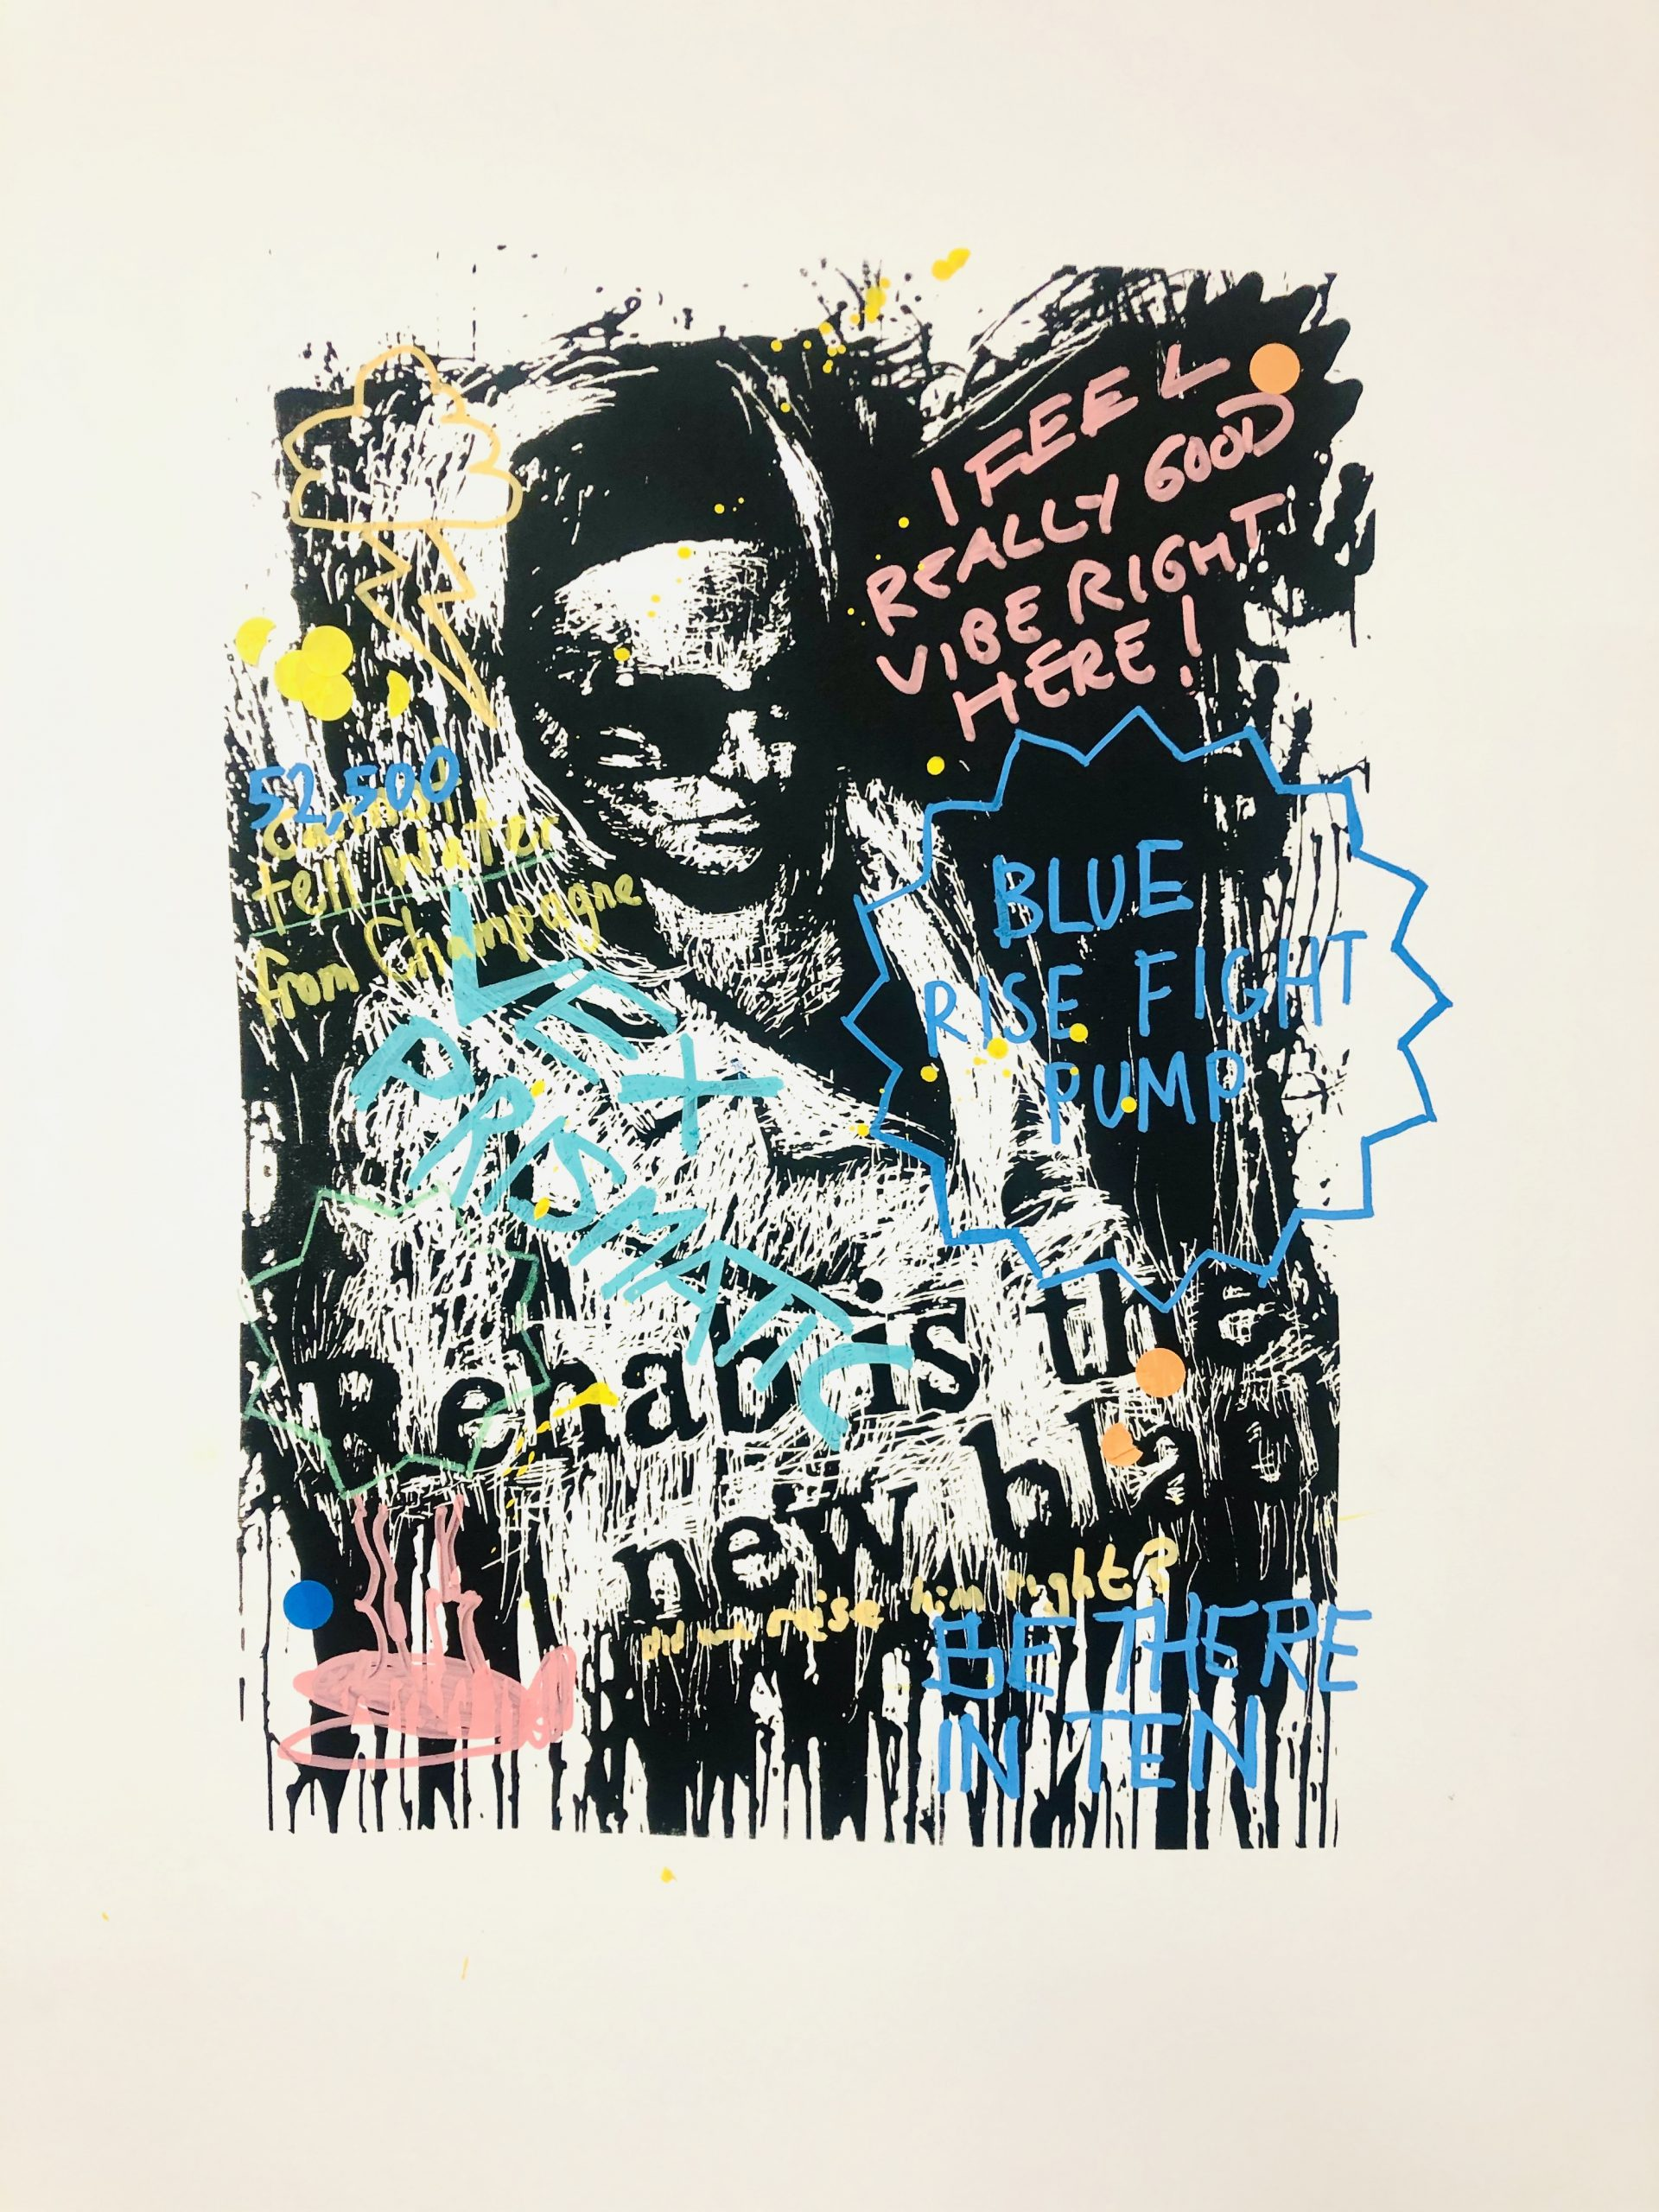 Blue-Rise-Fight-Pump-by-Nicolas-Ruston